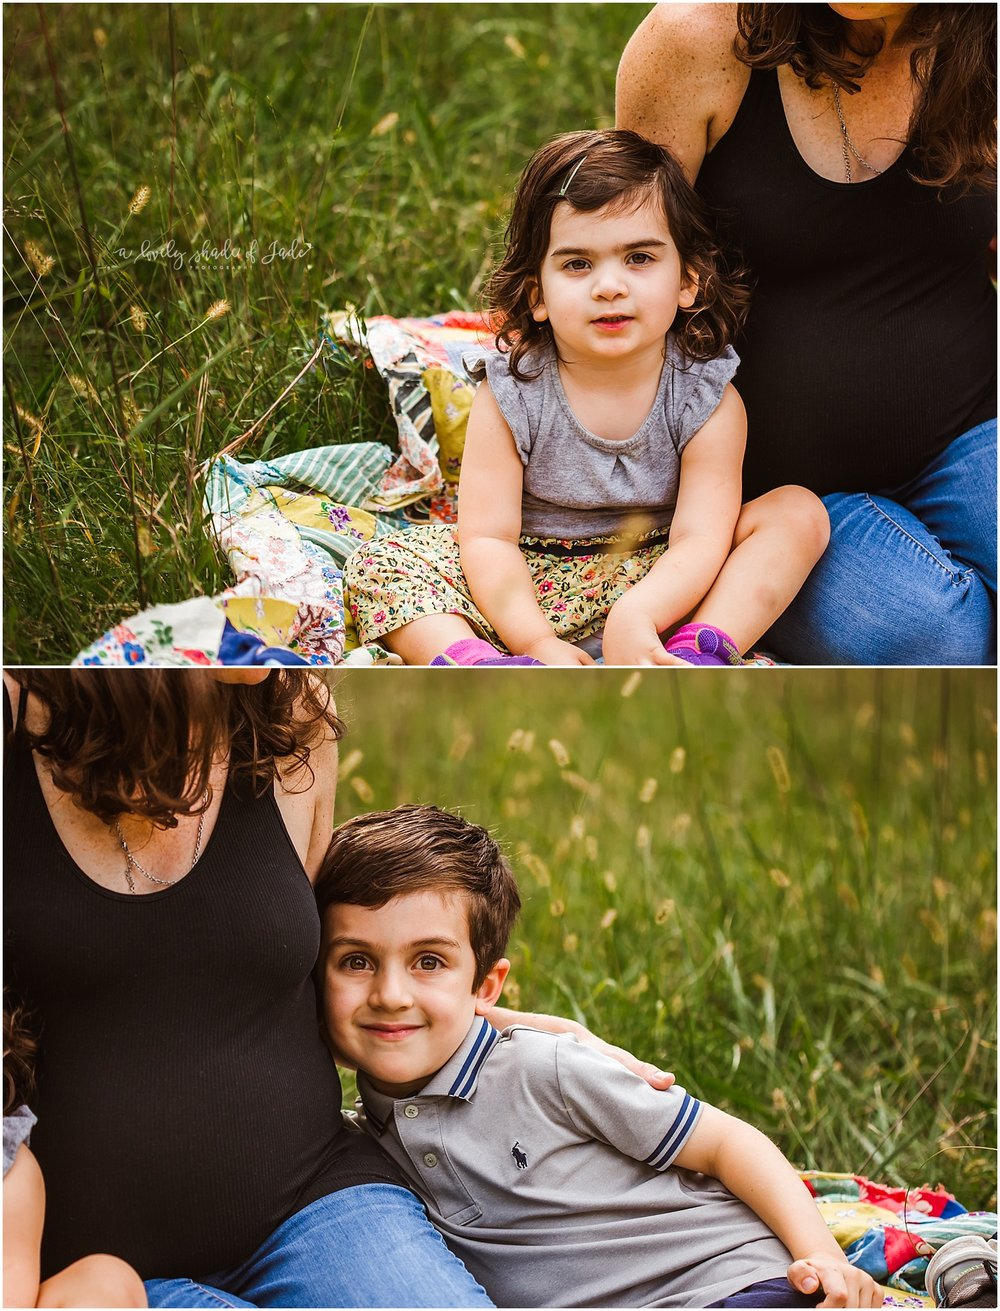 Phyllis_Maternity_Morristown_NJ__Photographer_0006.jpg